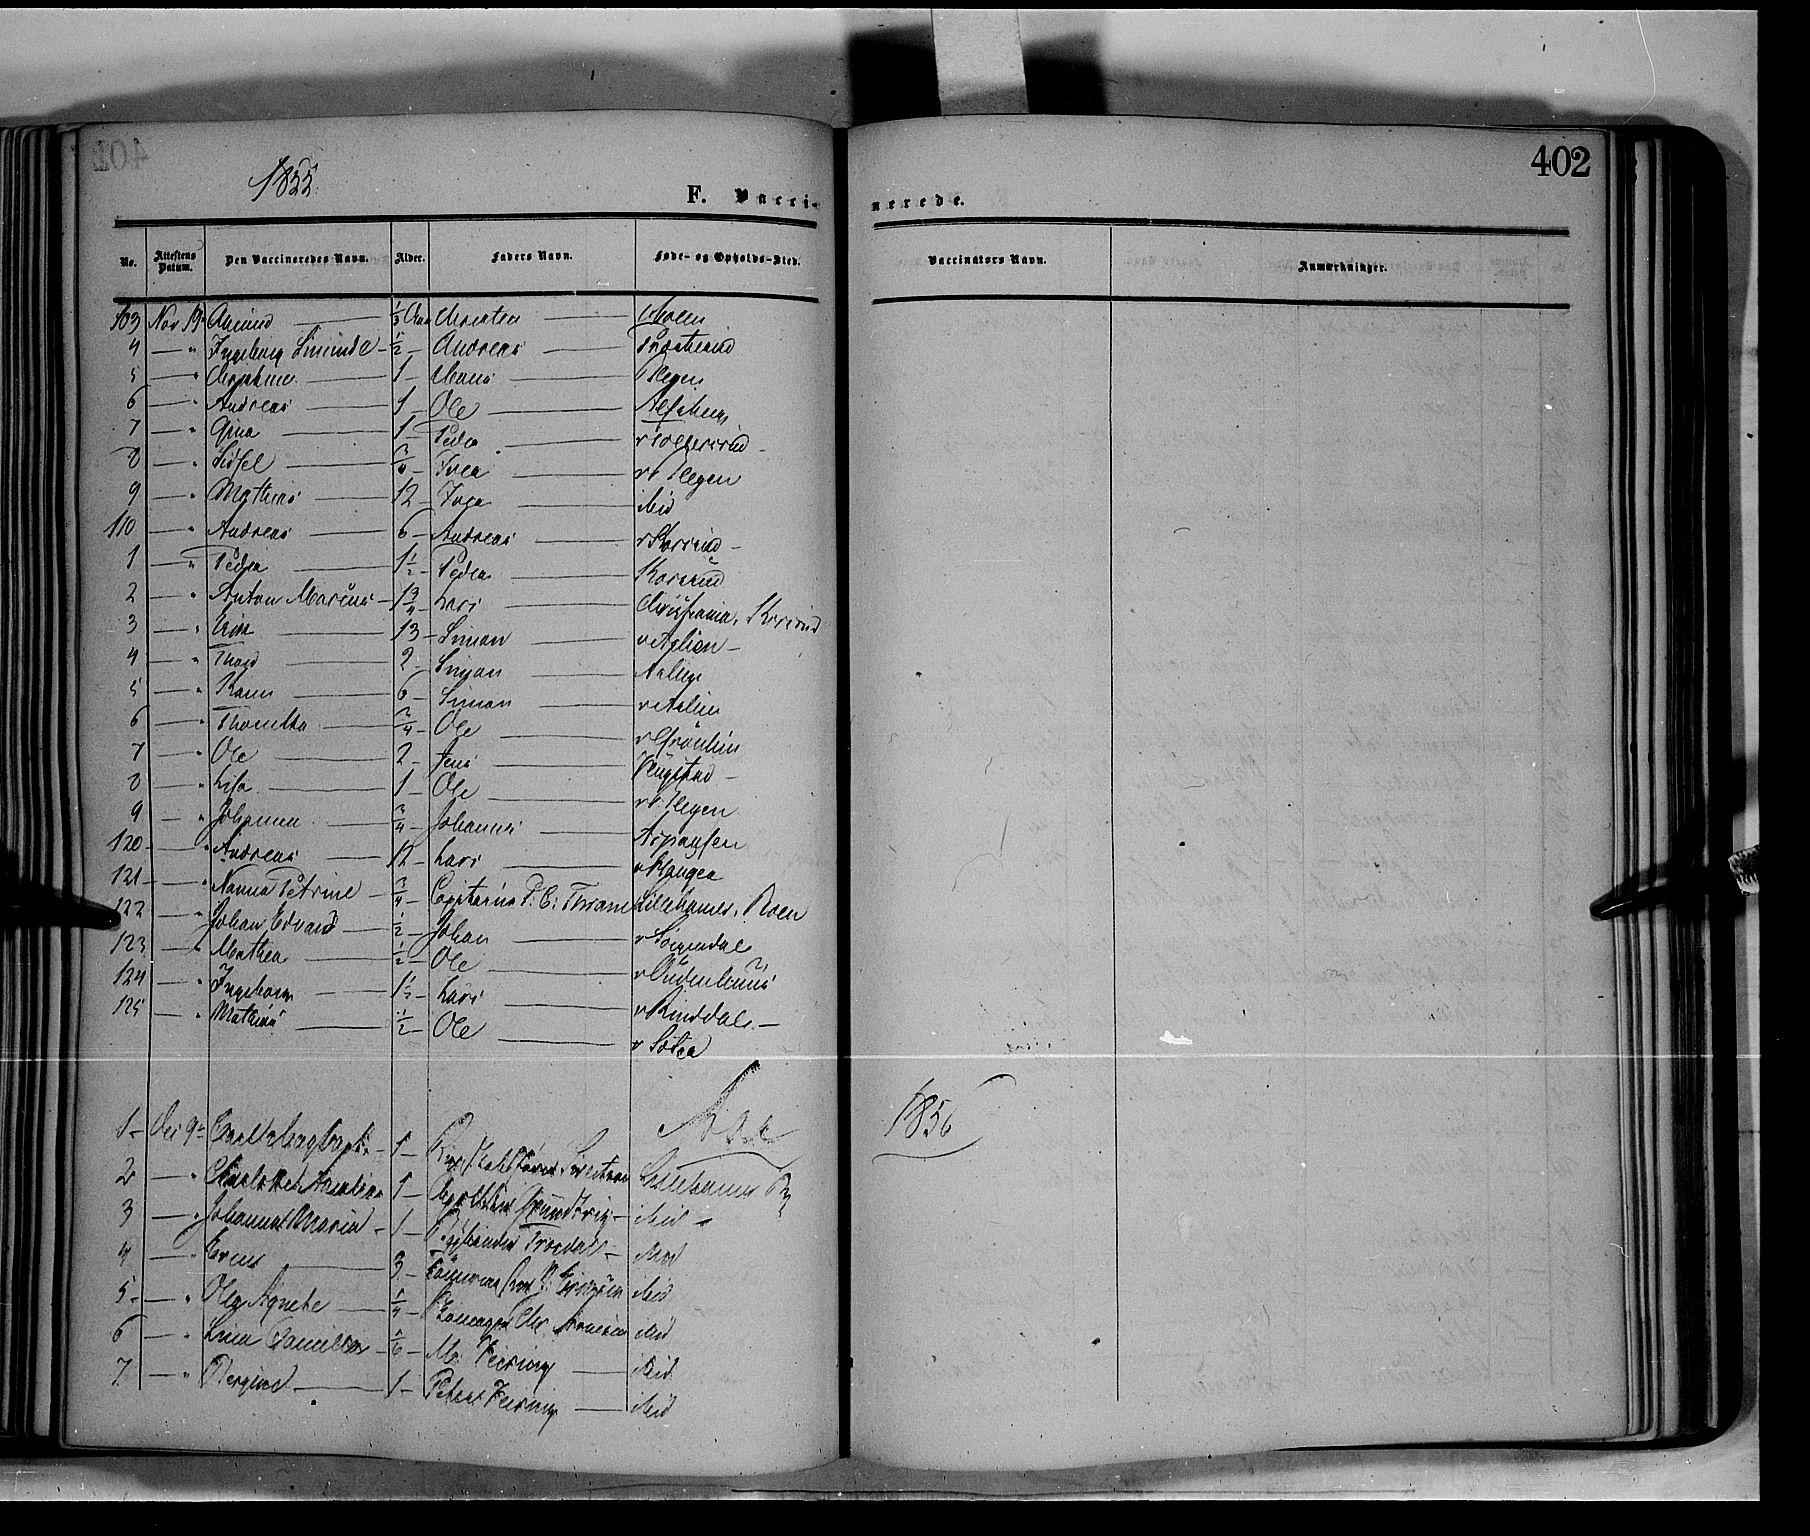 SAH, Fåberg prestekontor, Ministerialbok nr. 6B, 1855-1867, s. 402